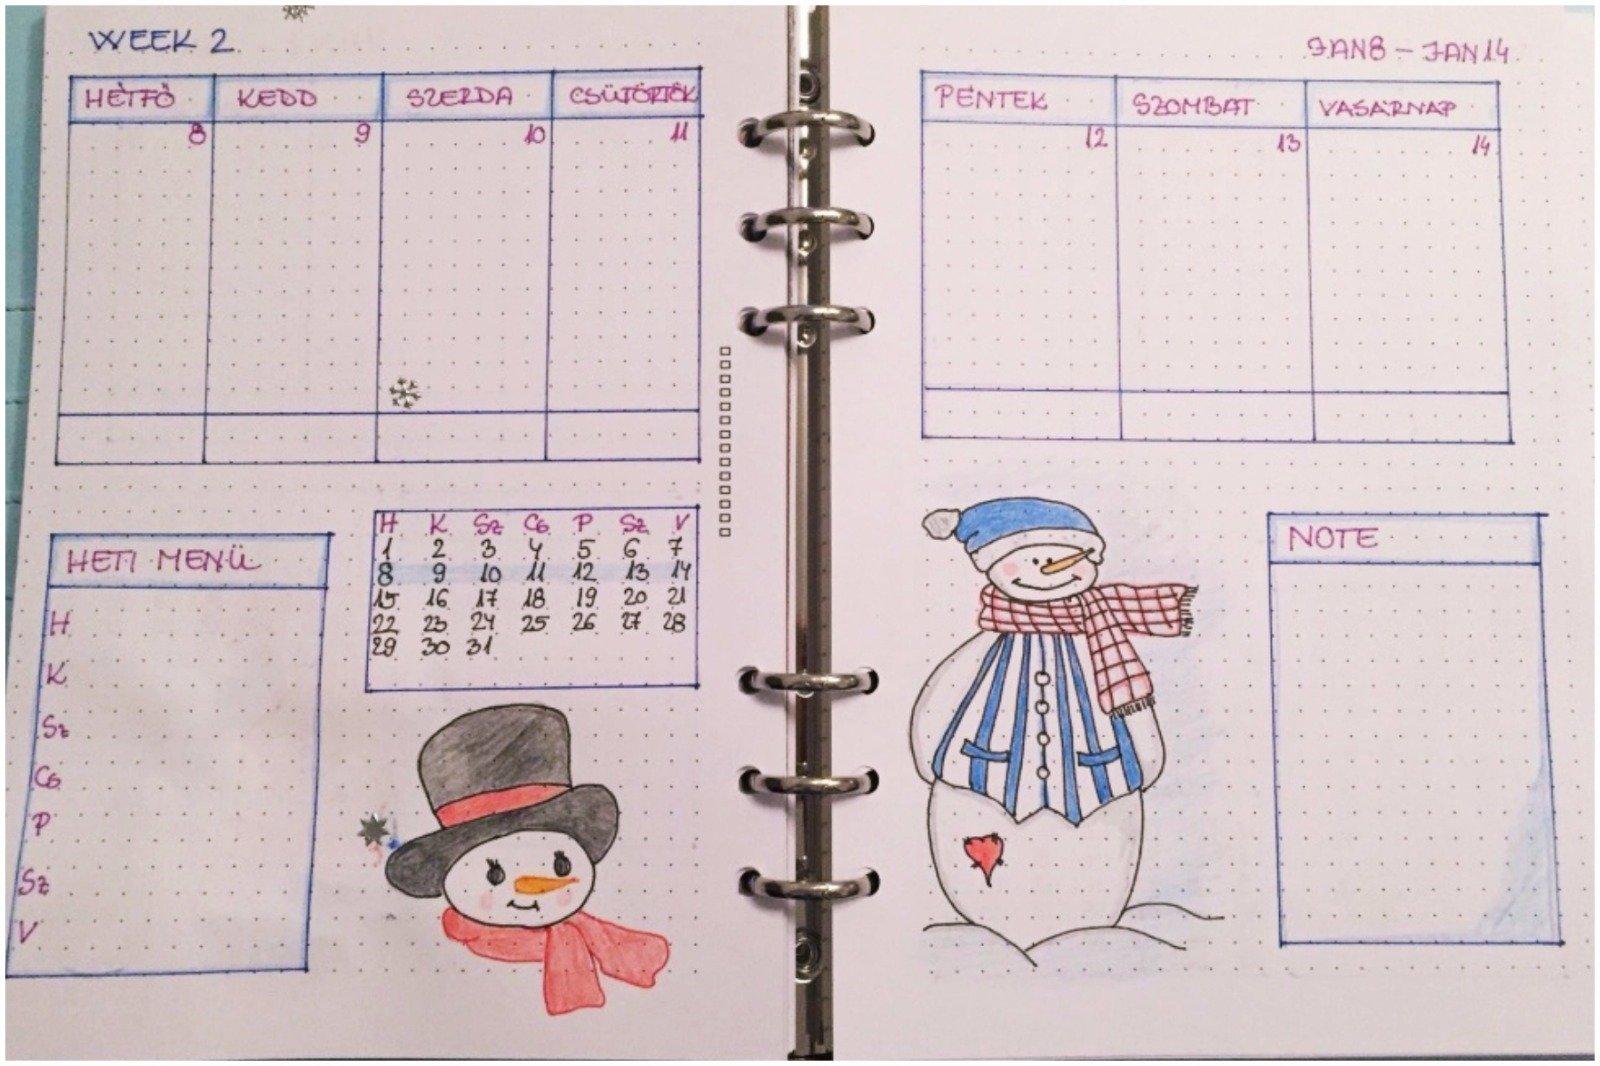 Creative journal weekly planner - week 2 - itstartswithacoffee.com #creativejournaling #weekly #weeklyplanner #2018 #january #2018January #planner